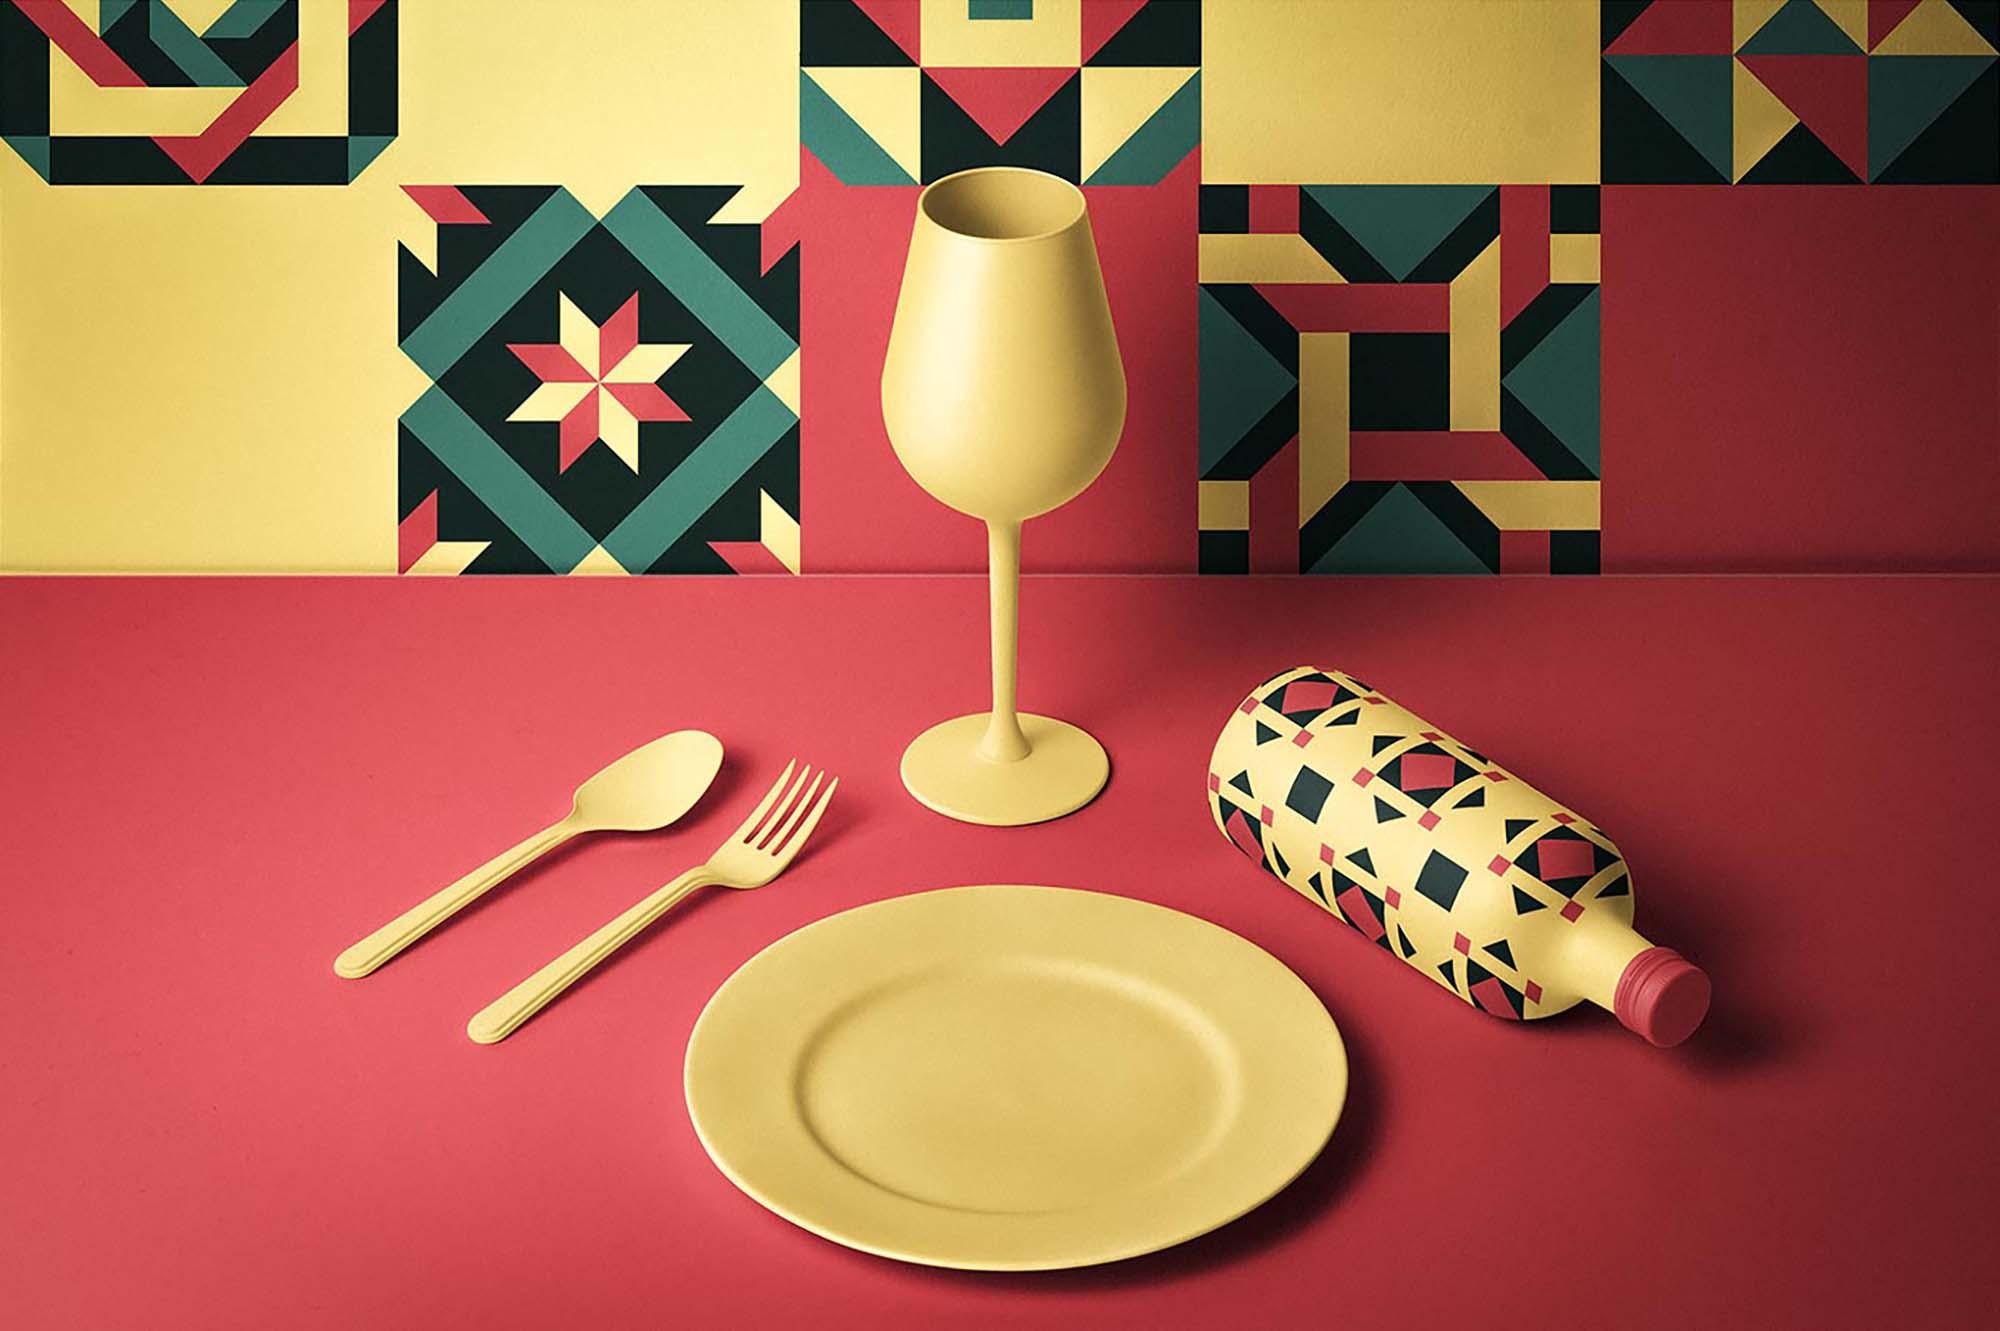 Portuguese Geometric Patterns 6